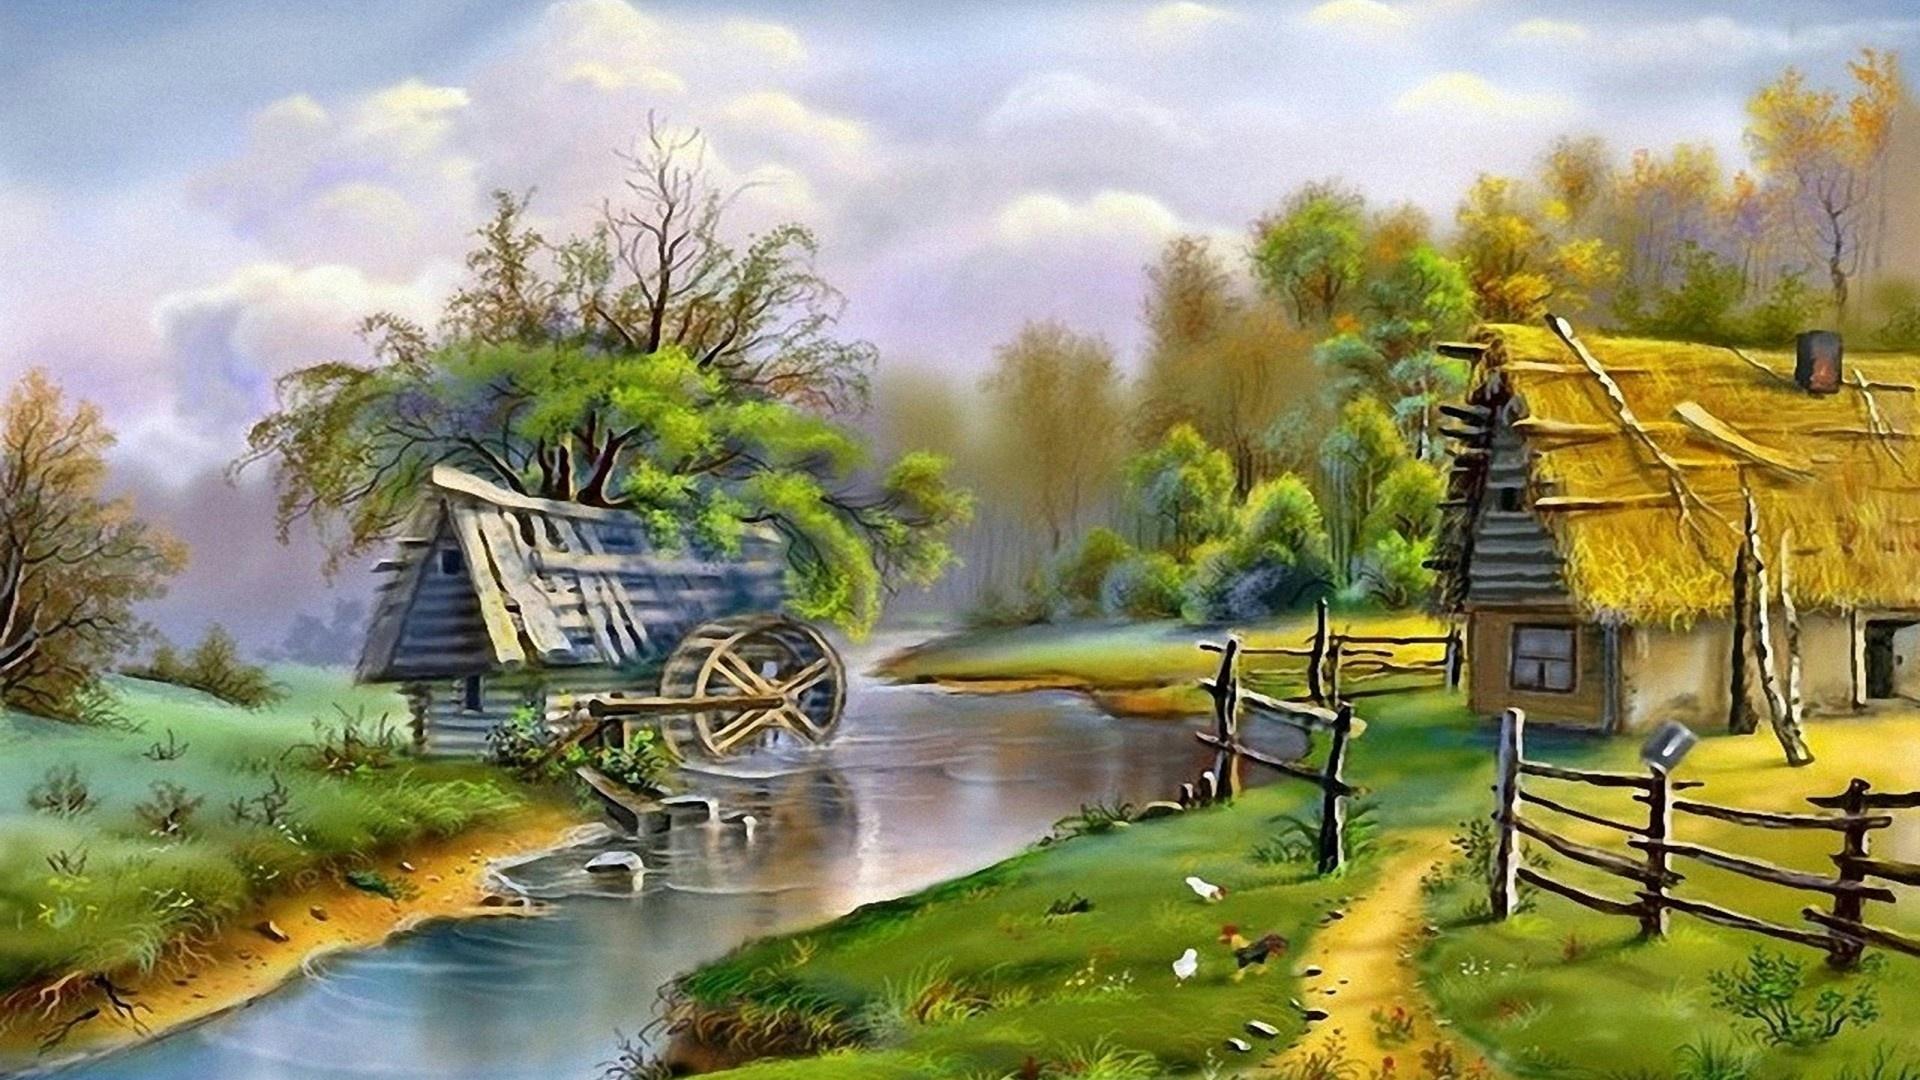 Village House Art Wallpaper